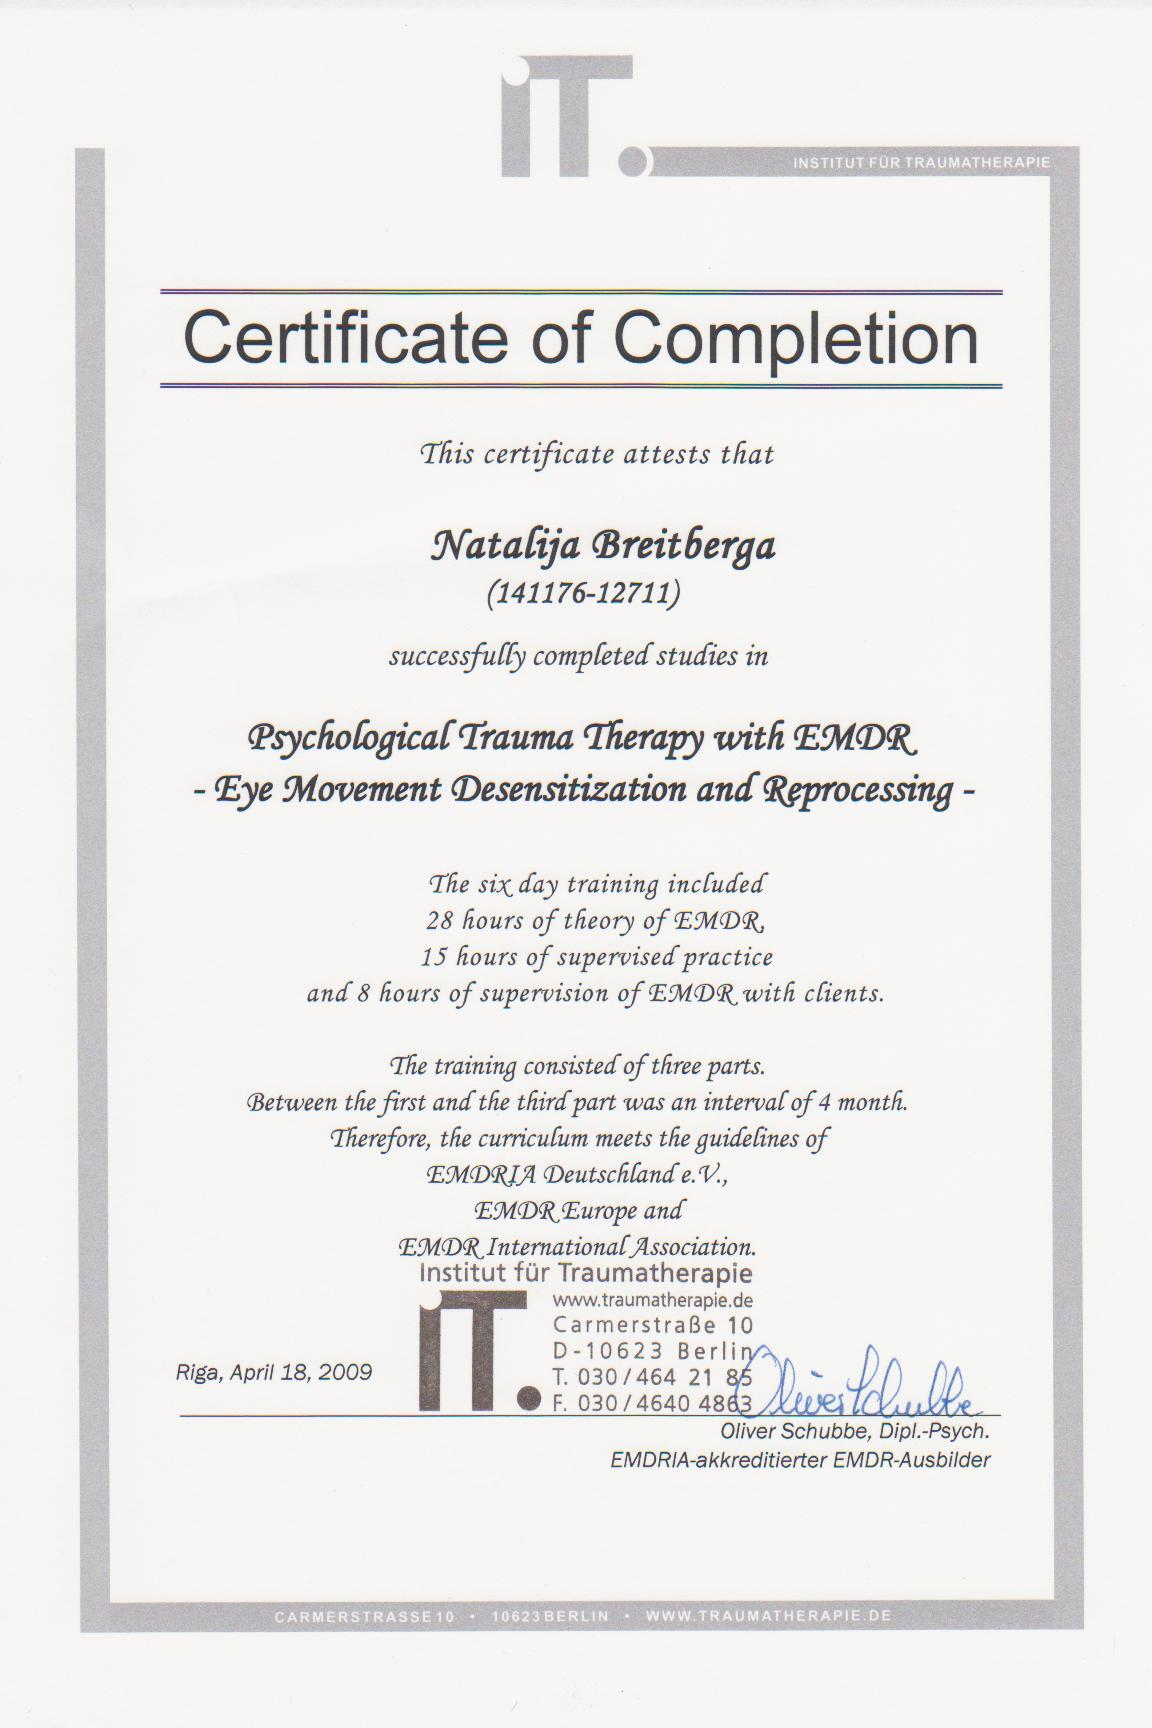 emdr-sertifikats